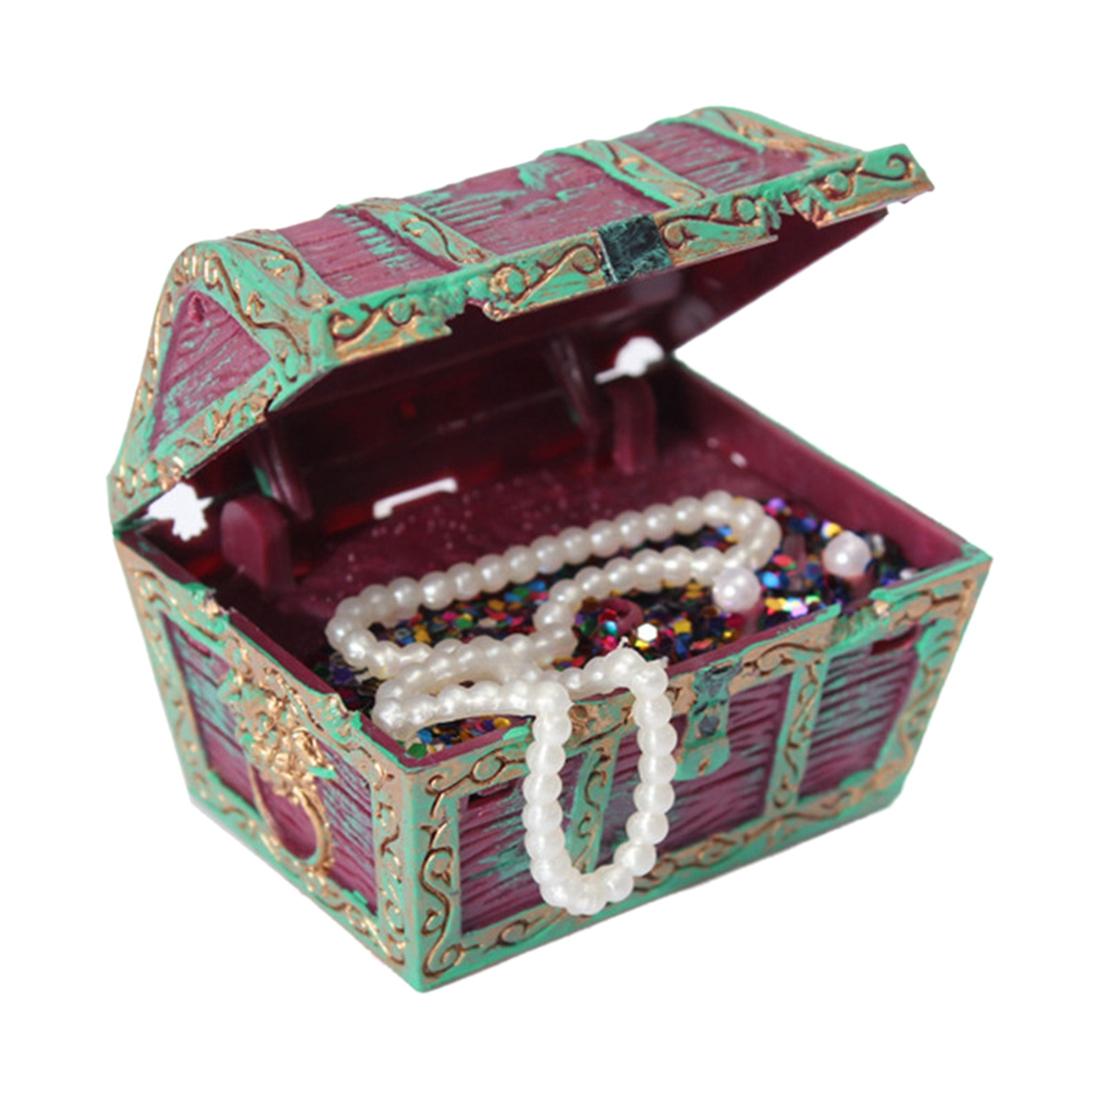 Aquarium decoration treasure chest treasure chest pirate for Fish tank treasure chest